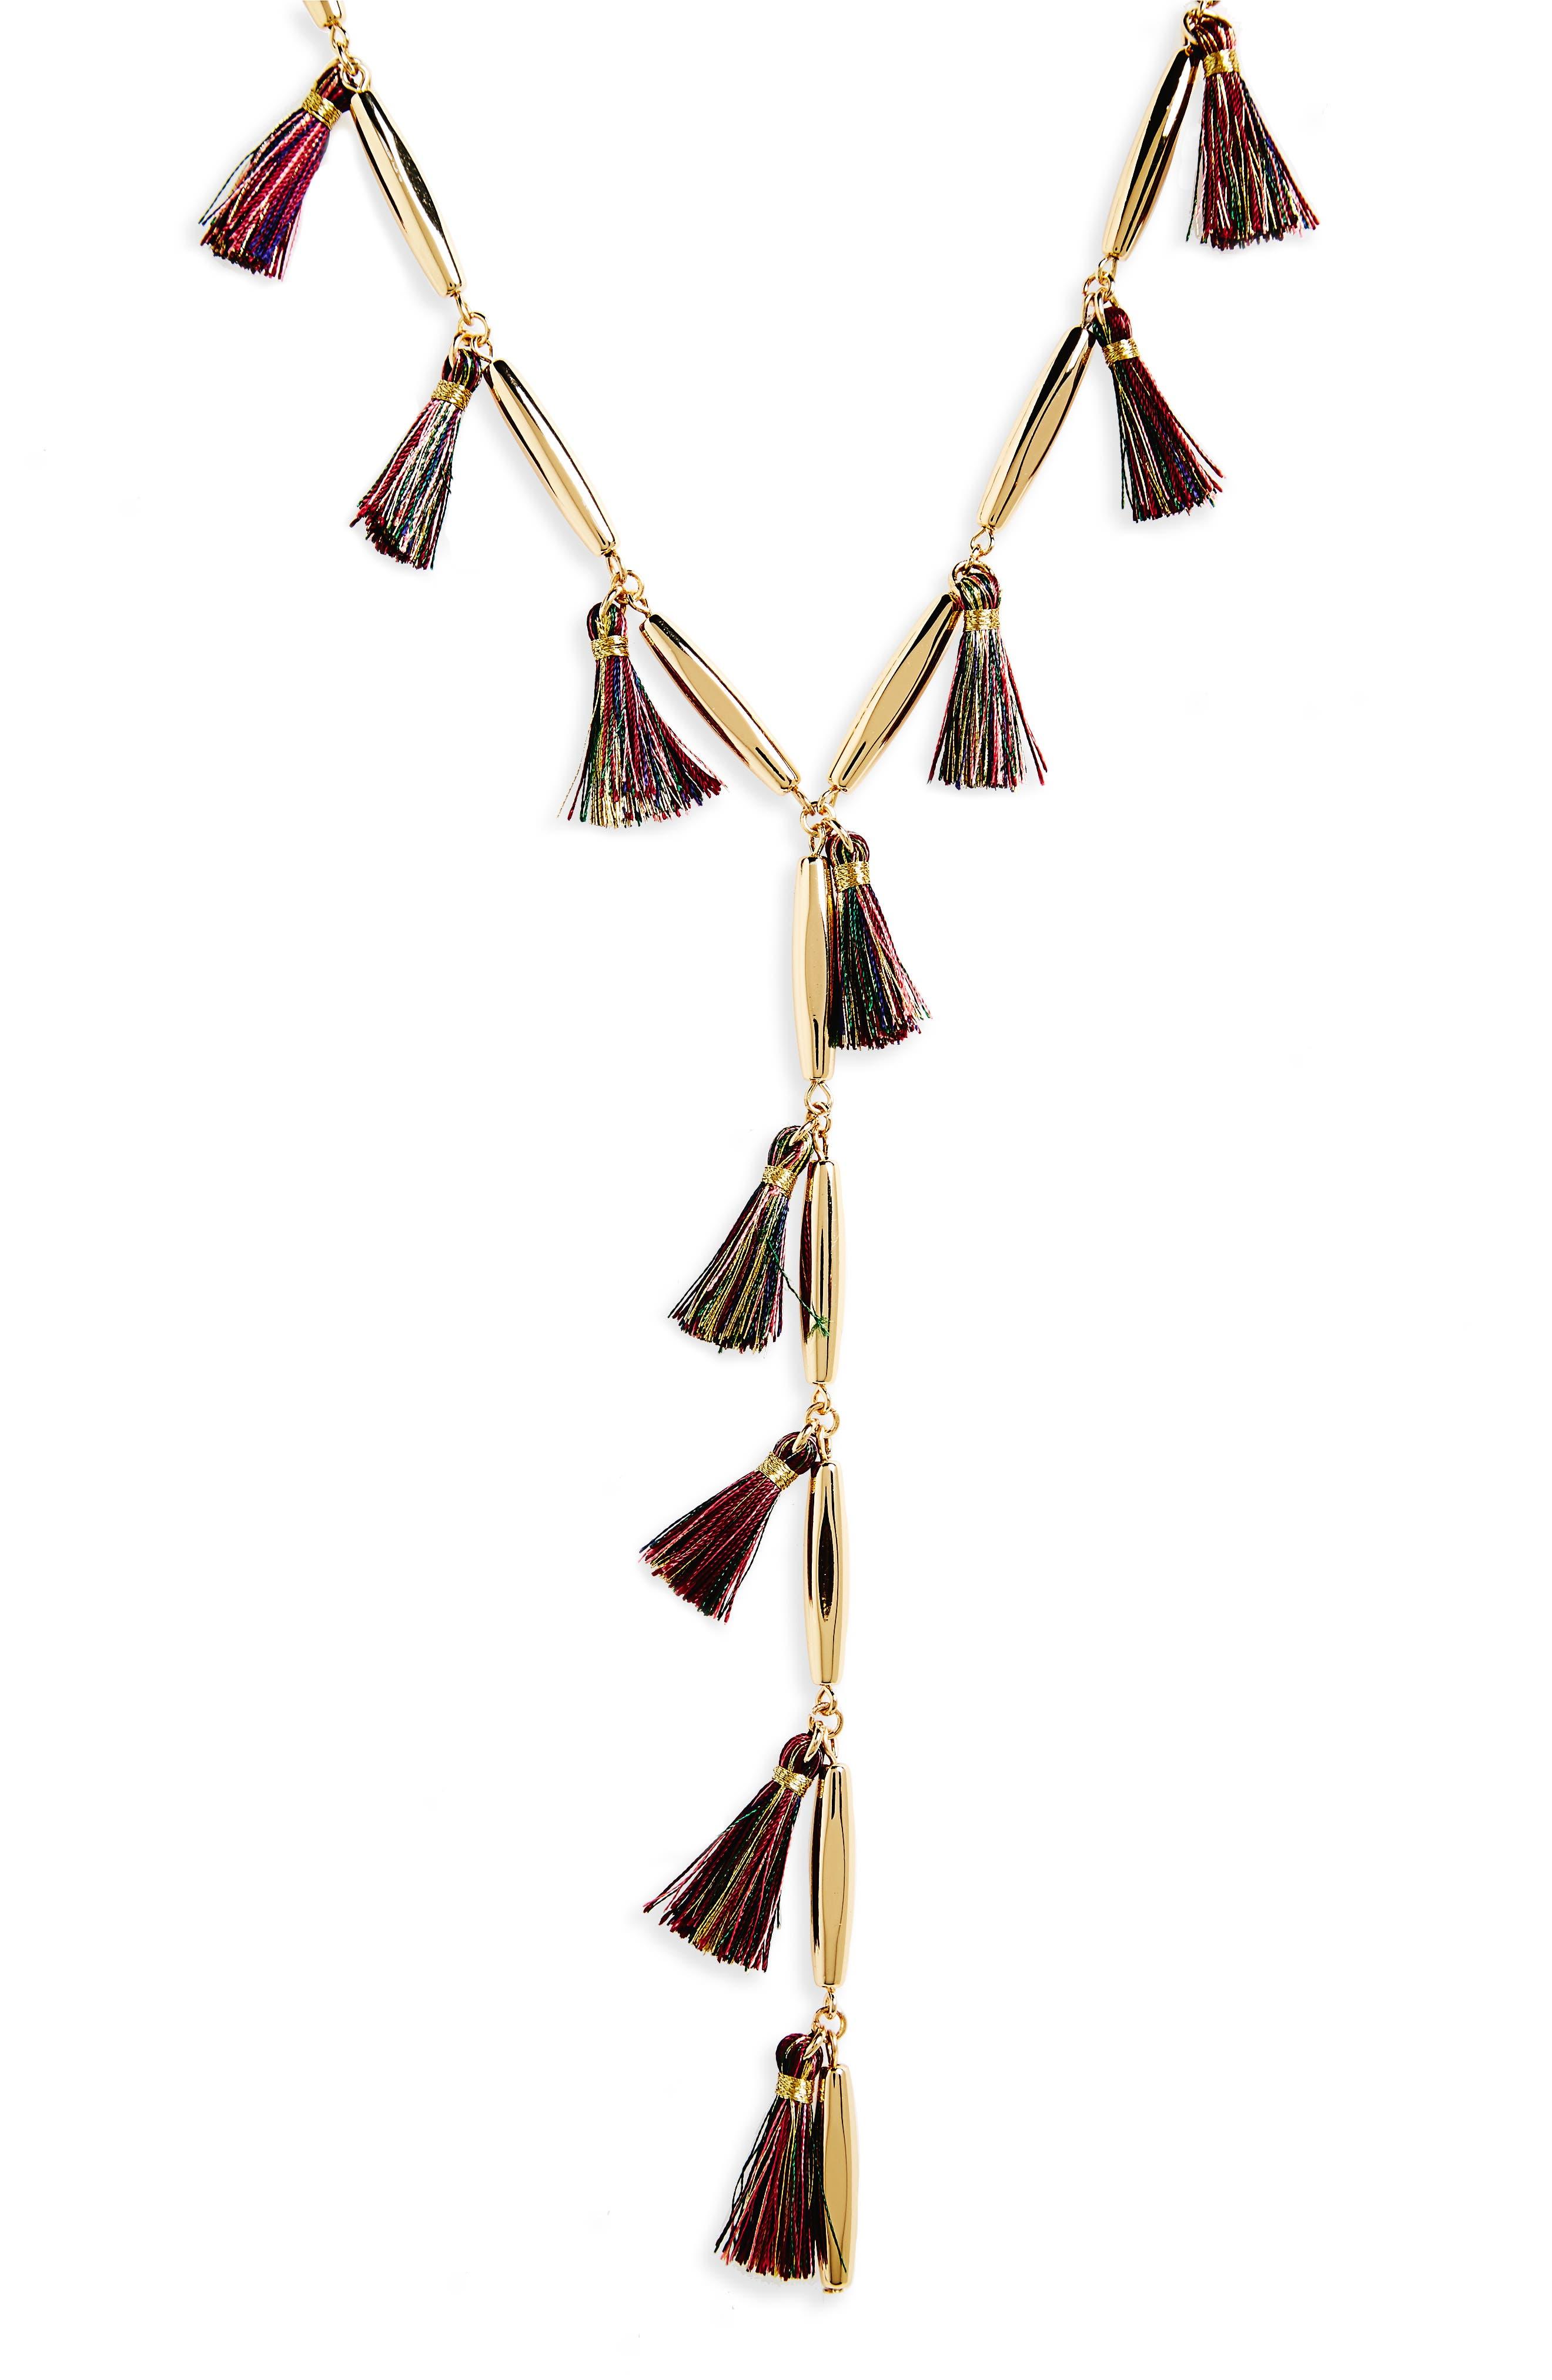 Tassel Y-Necklace,                             Alternate thumbnail 2, color,                             Gold/ Multi Tassels